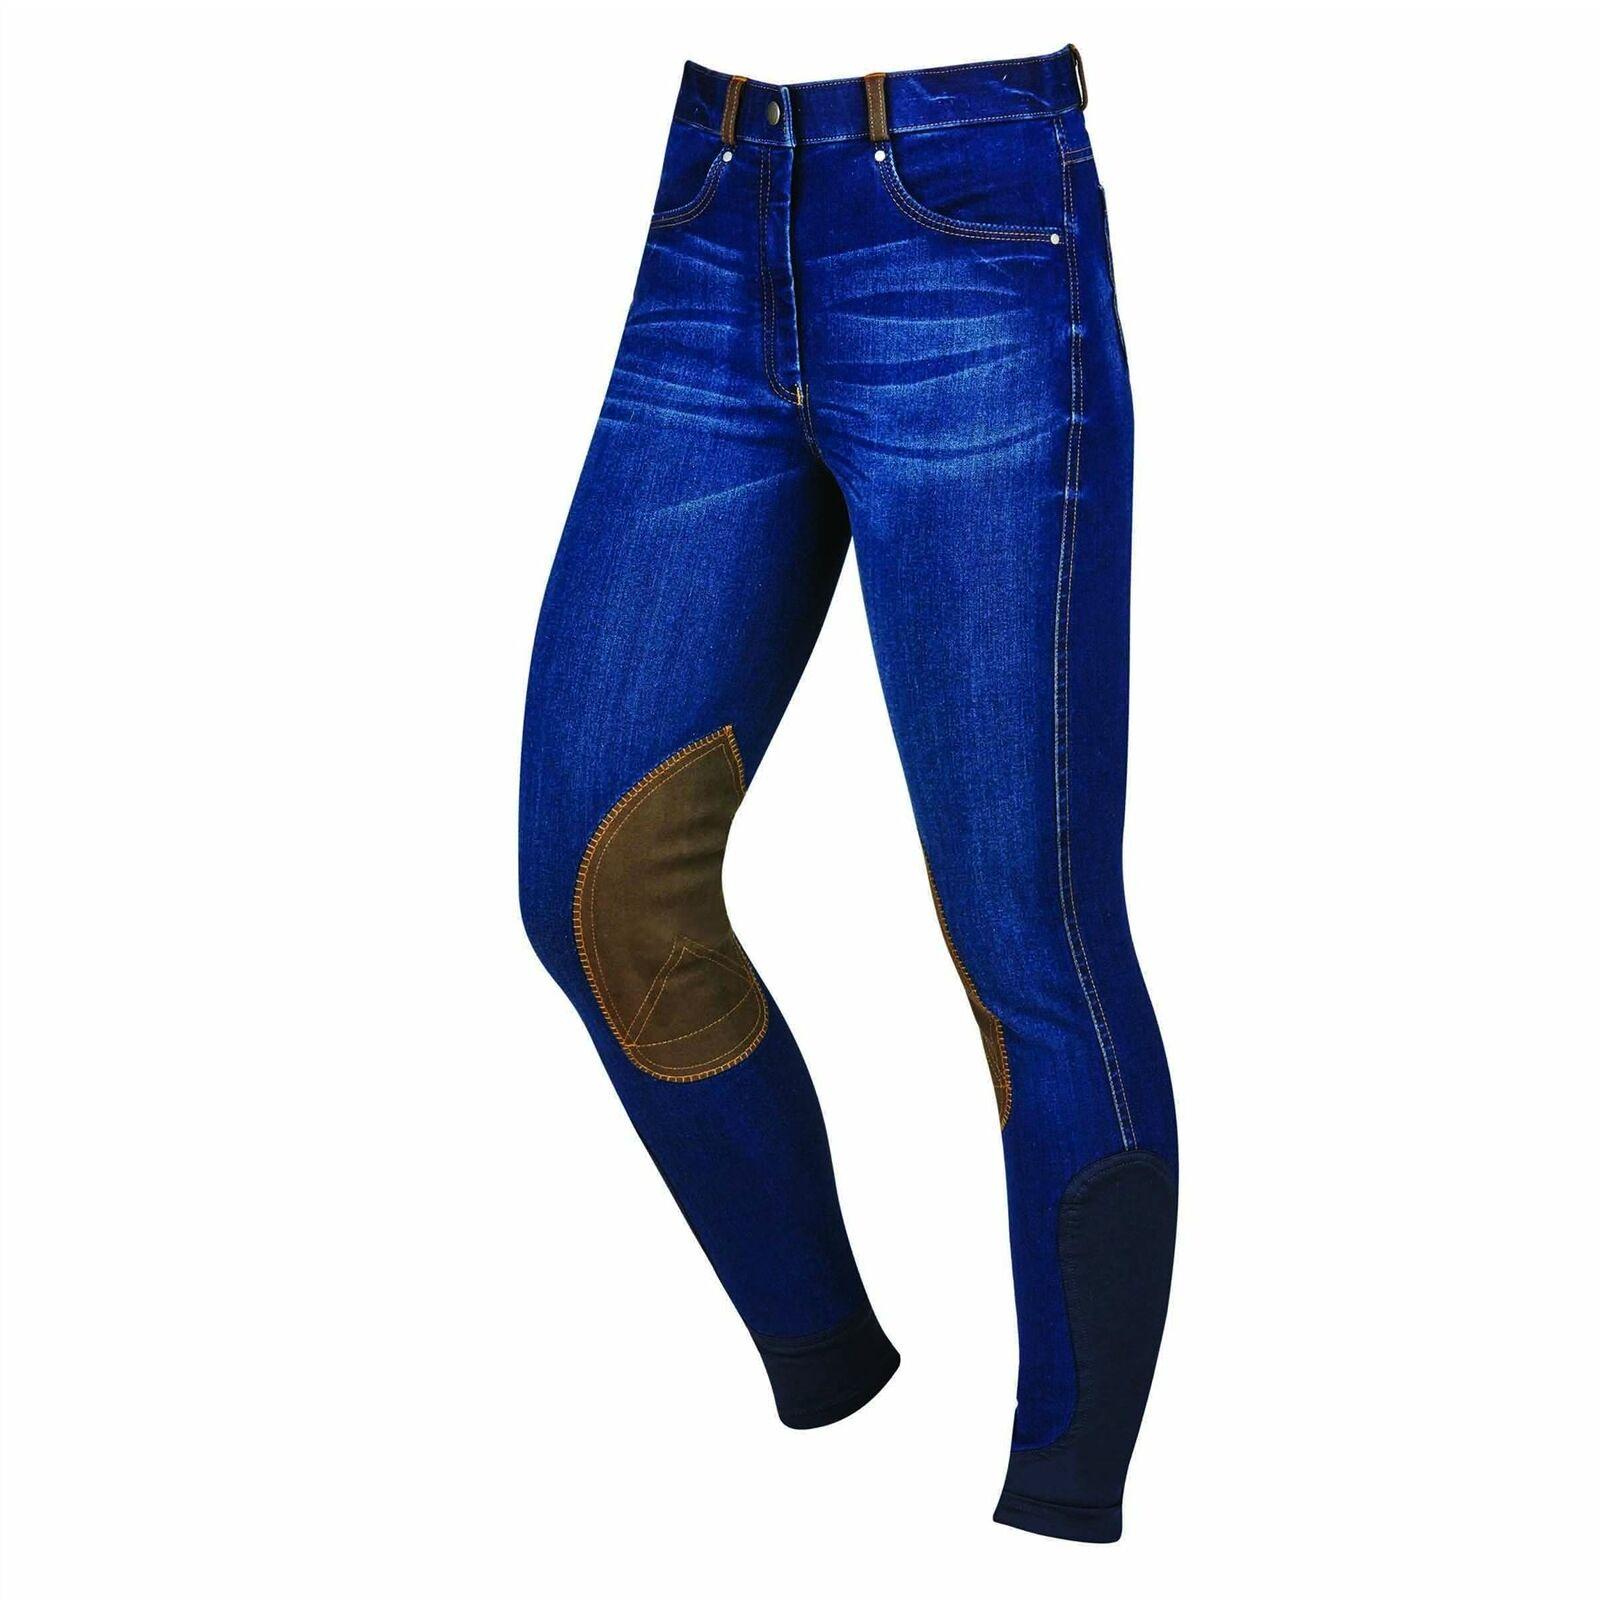 Dublin Shona Denim Breech Ladies Fullseat Kneepatch Washed Vintage Riding Jeans